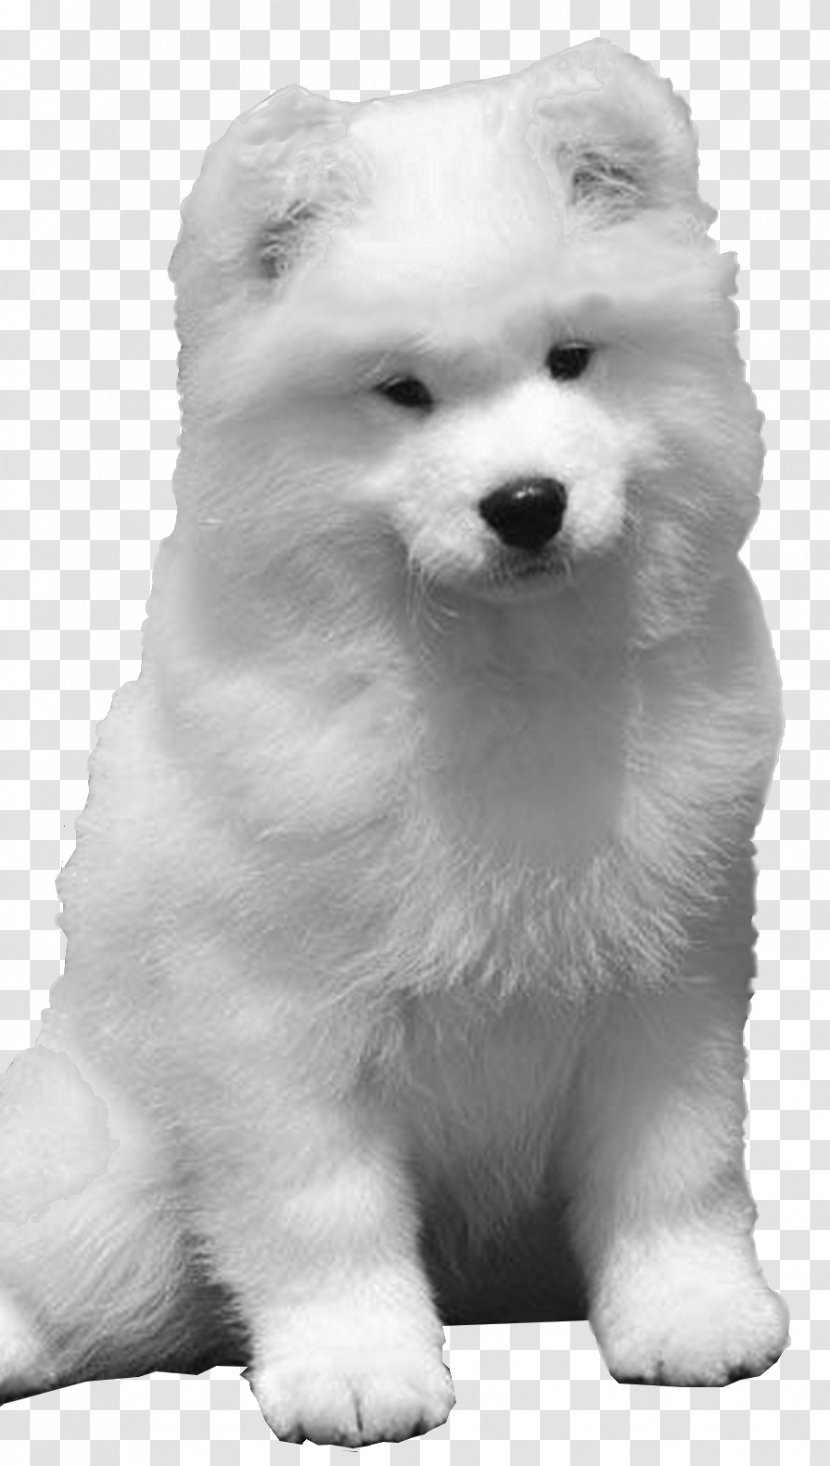 Samoyed Dog American Eskimo Siberian Husky Pomeranian Puppy Sakhalin Transparent Png